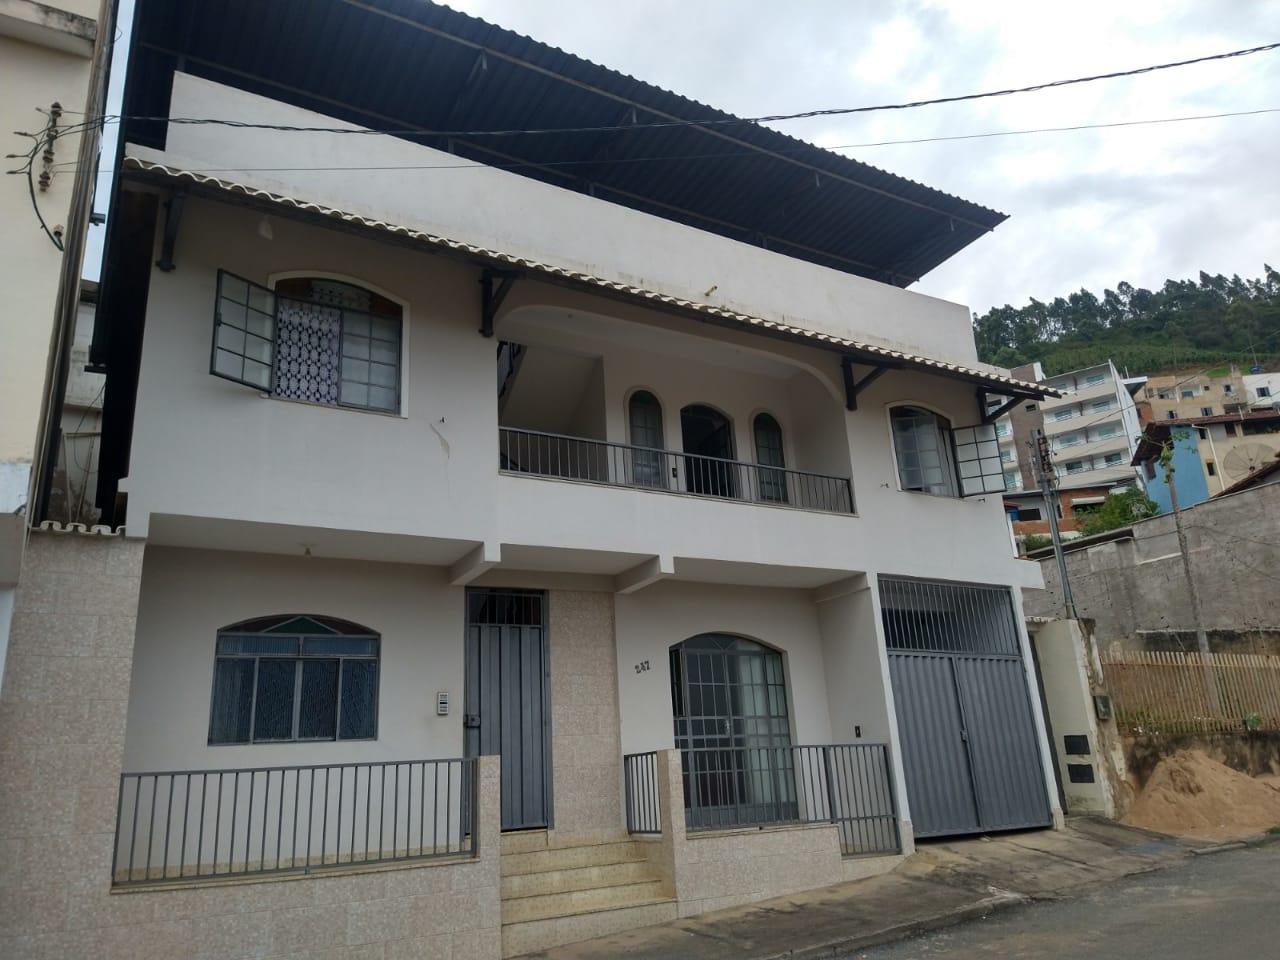 Casa no Bairro Luciano Heringer